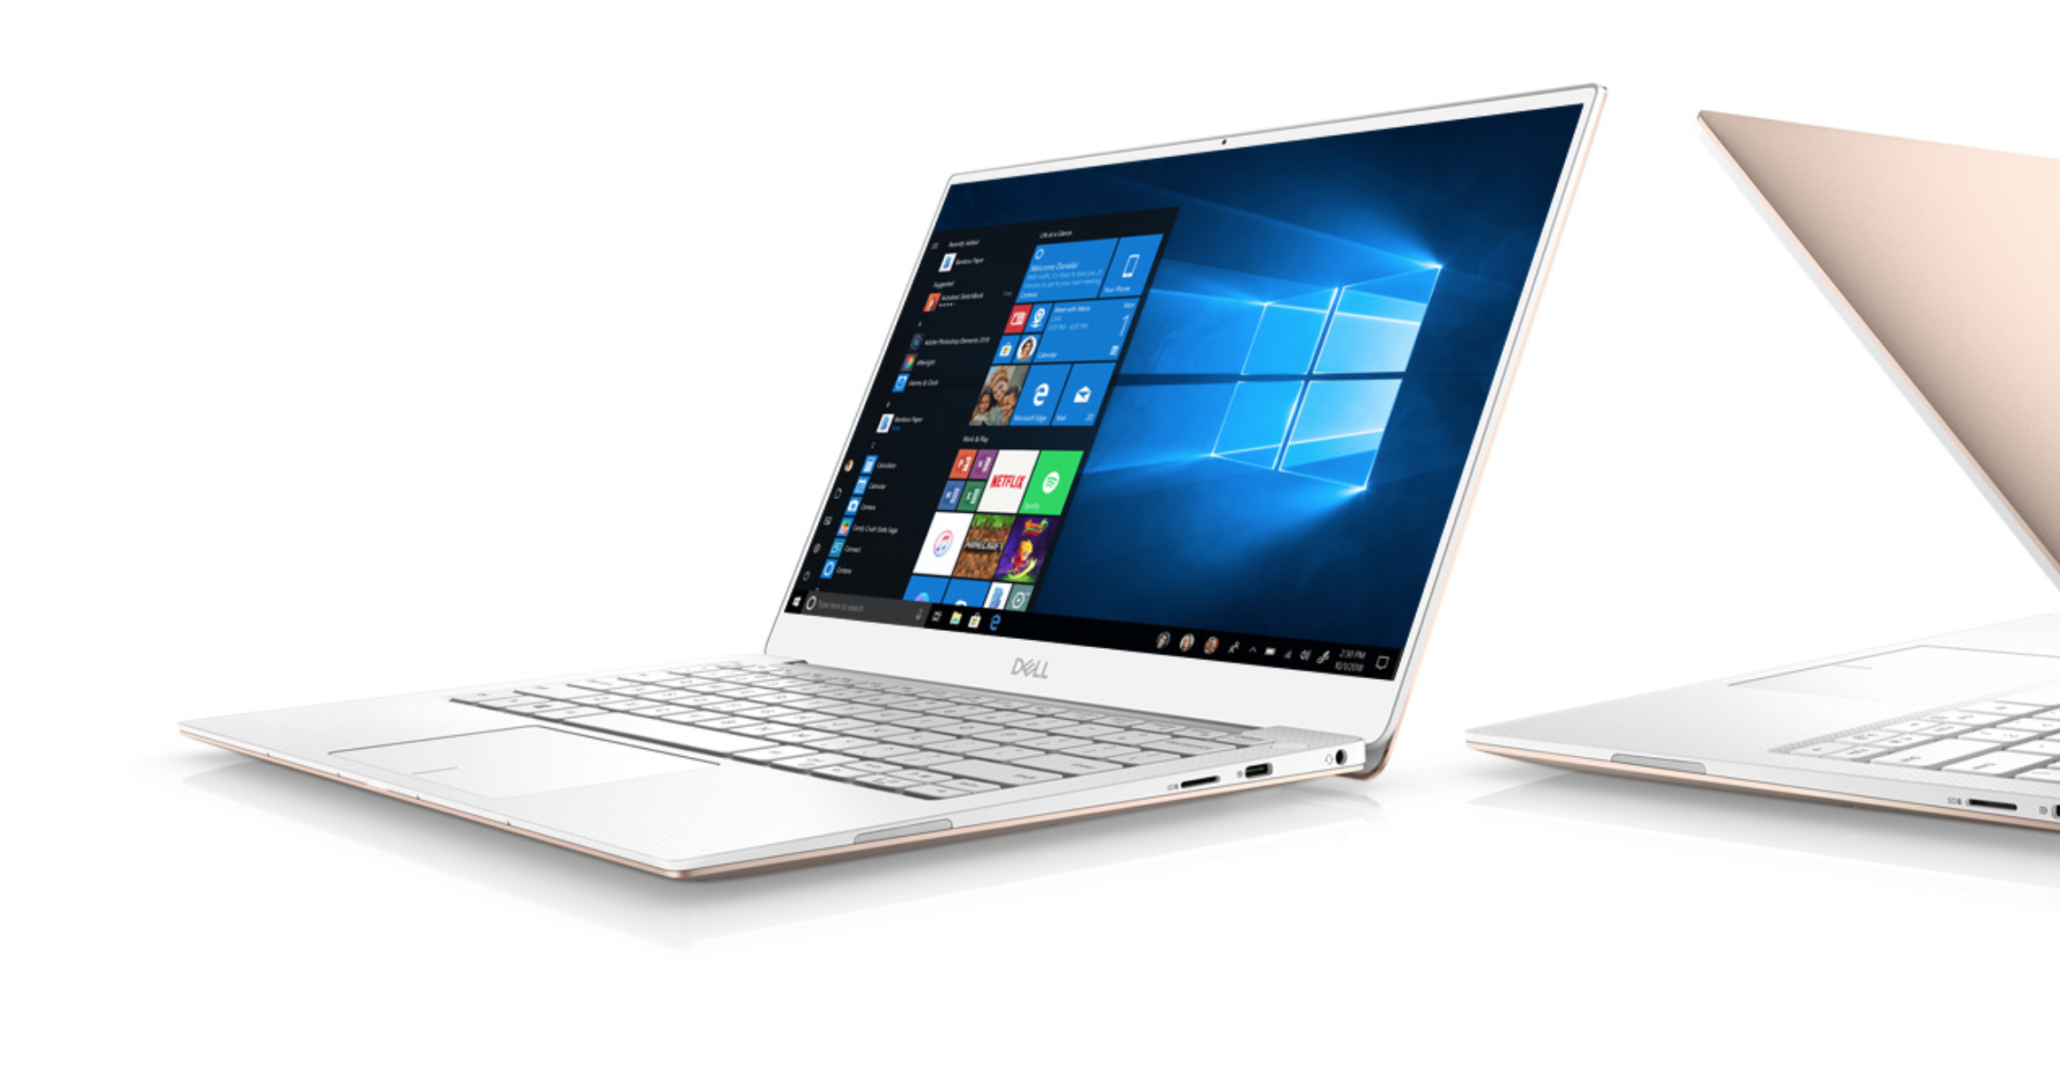 Fresh Windows 10 Cumulative Updates Delivered Over the Weekend